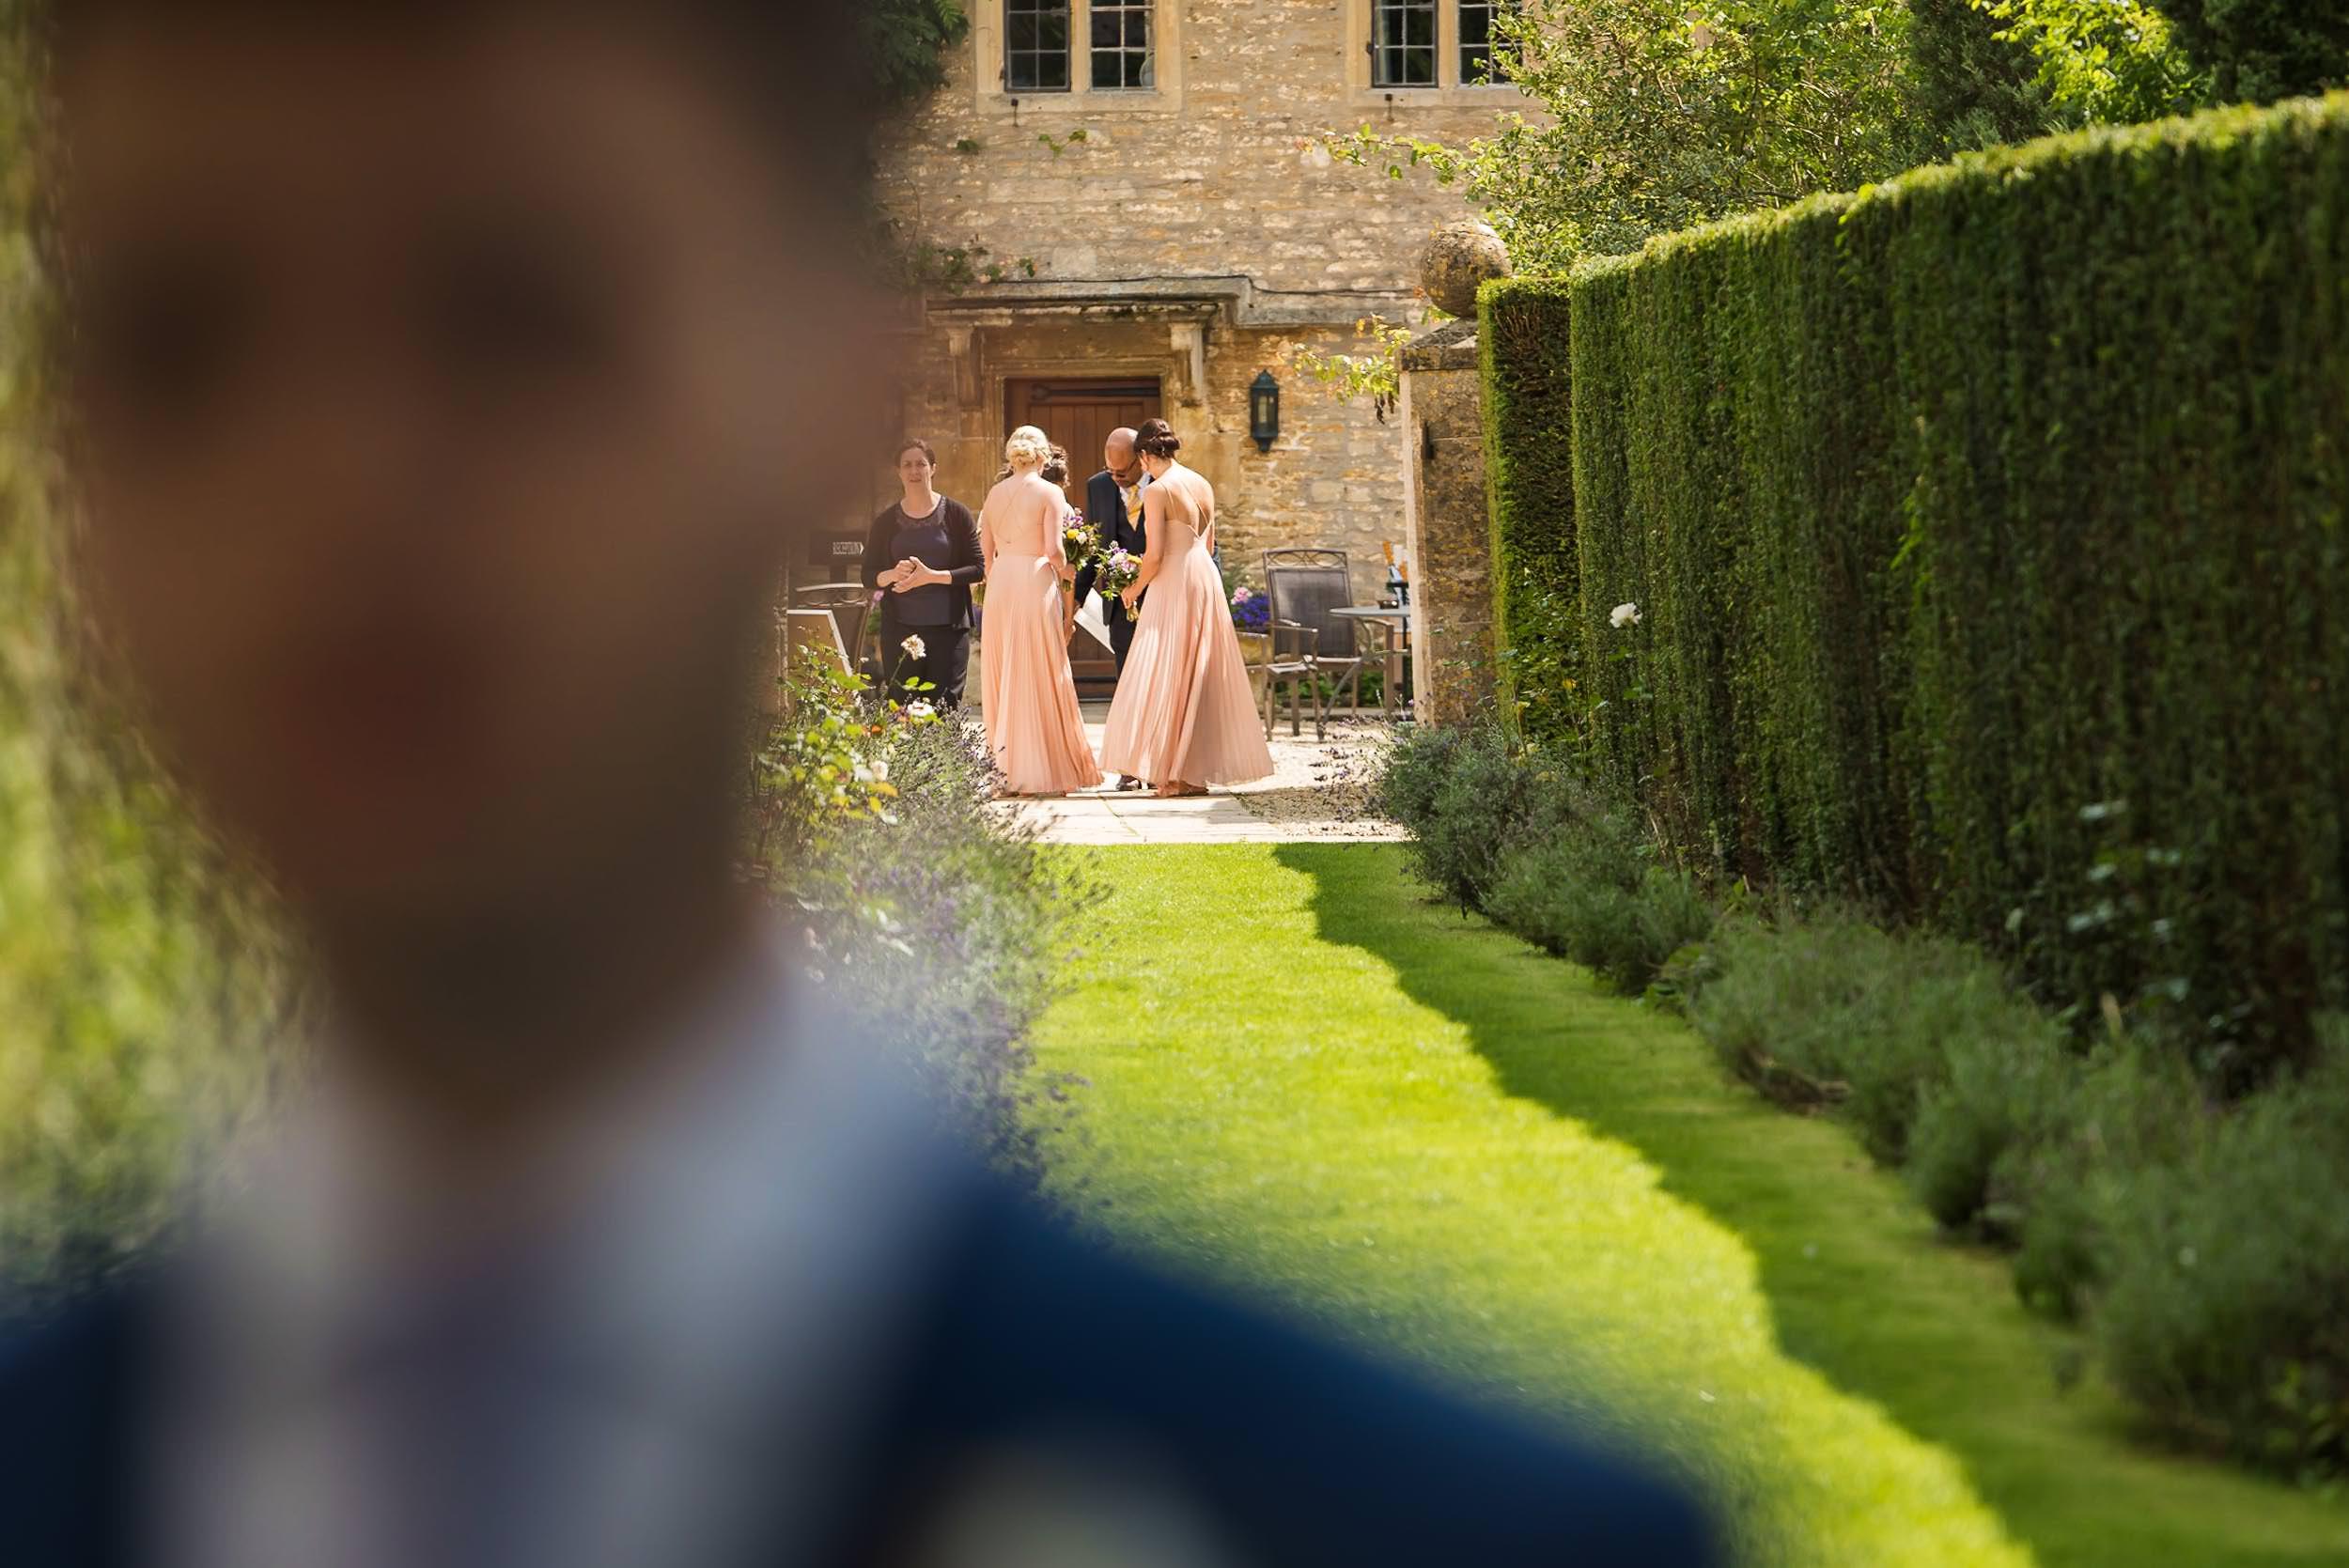 NC-20170805-2017-07-05_lara-and-nick-wedding-0211.jpg